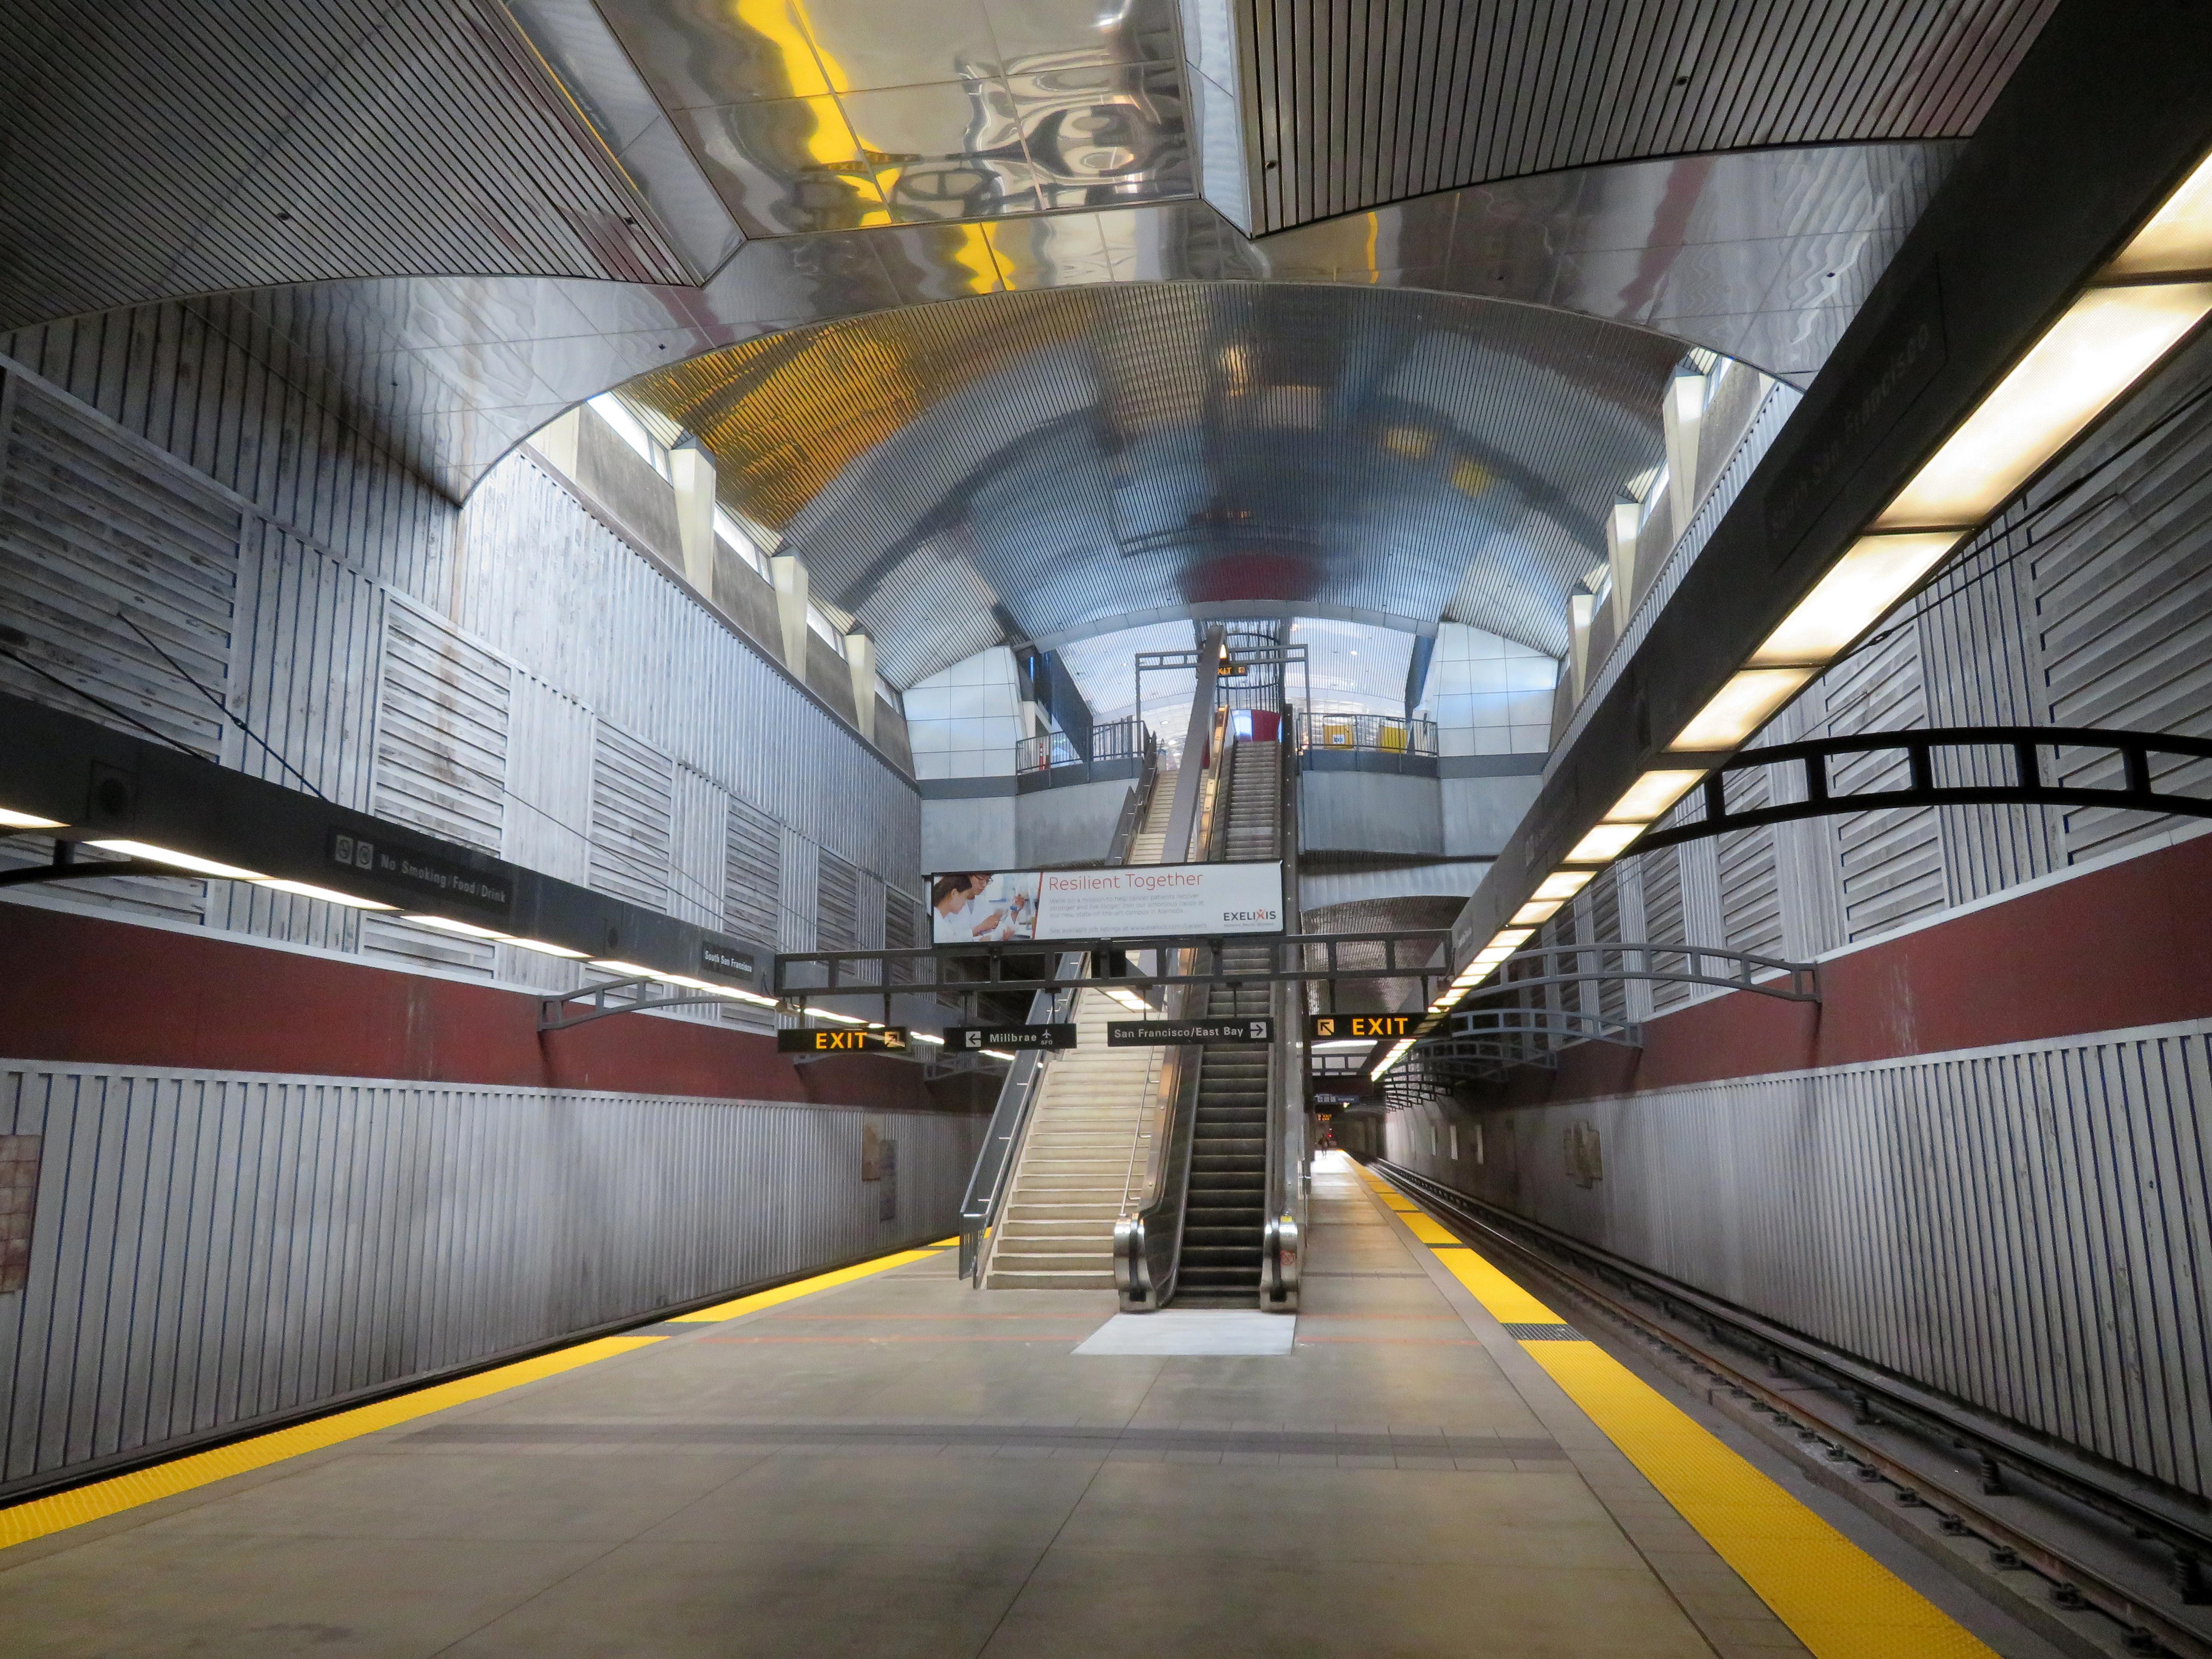 South San Francisco station (BART) - Wikipedia